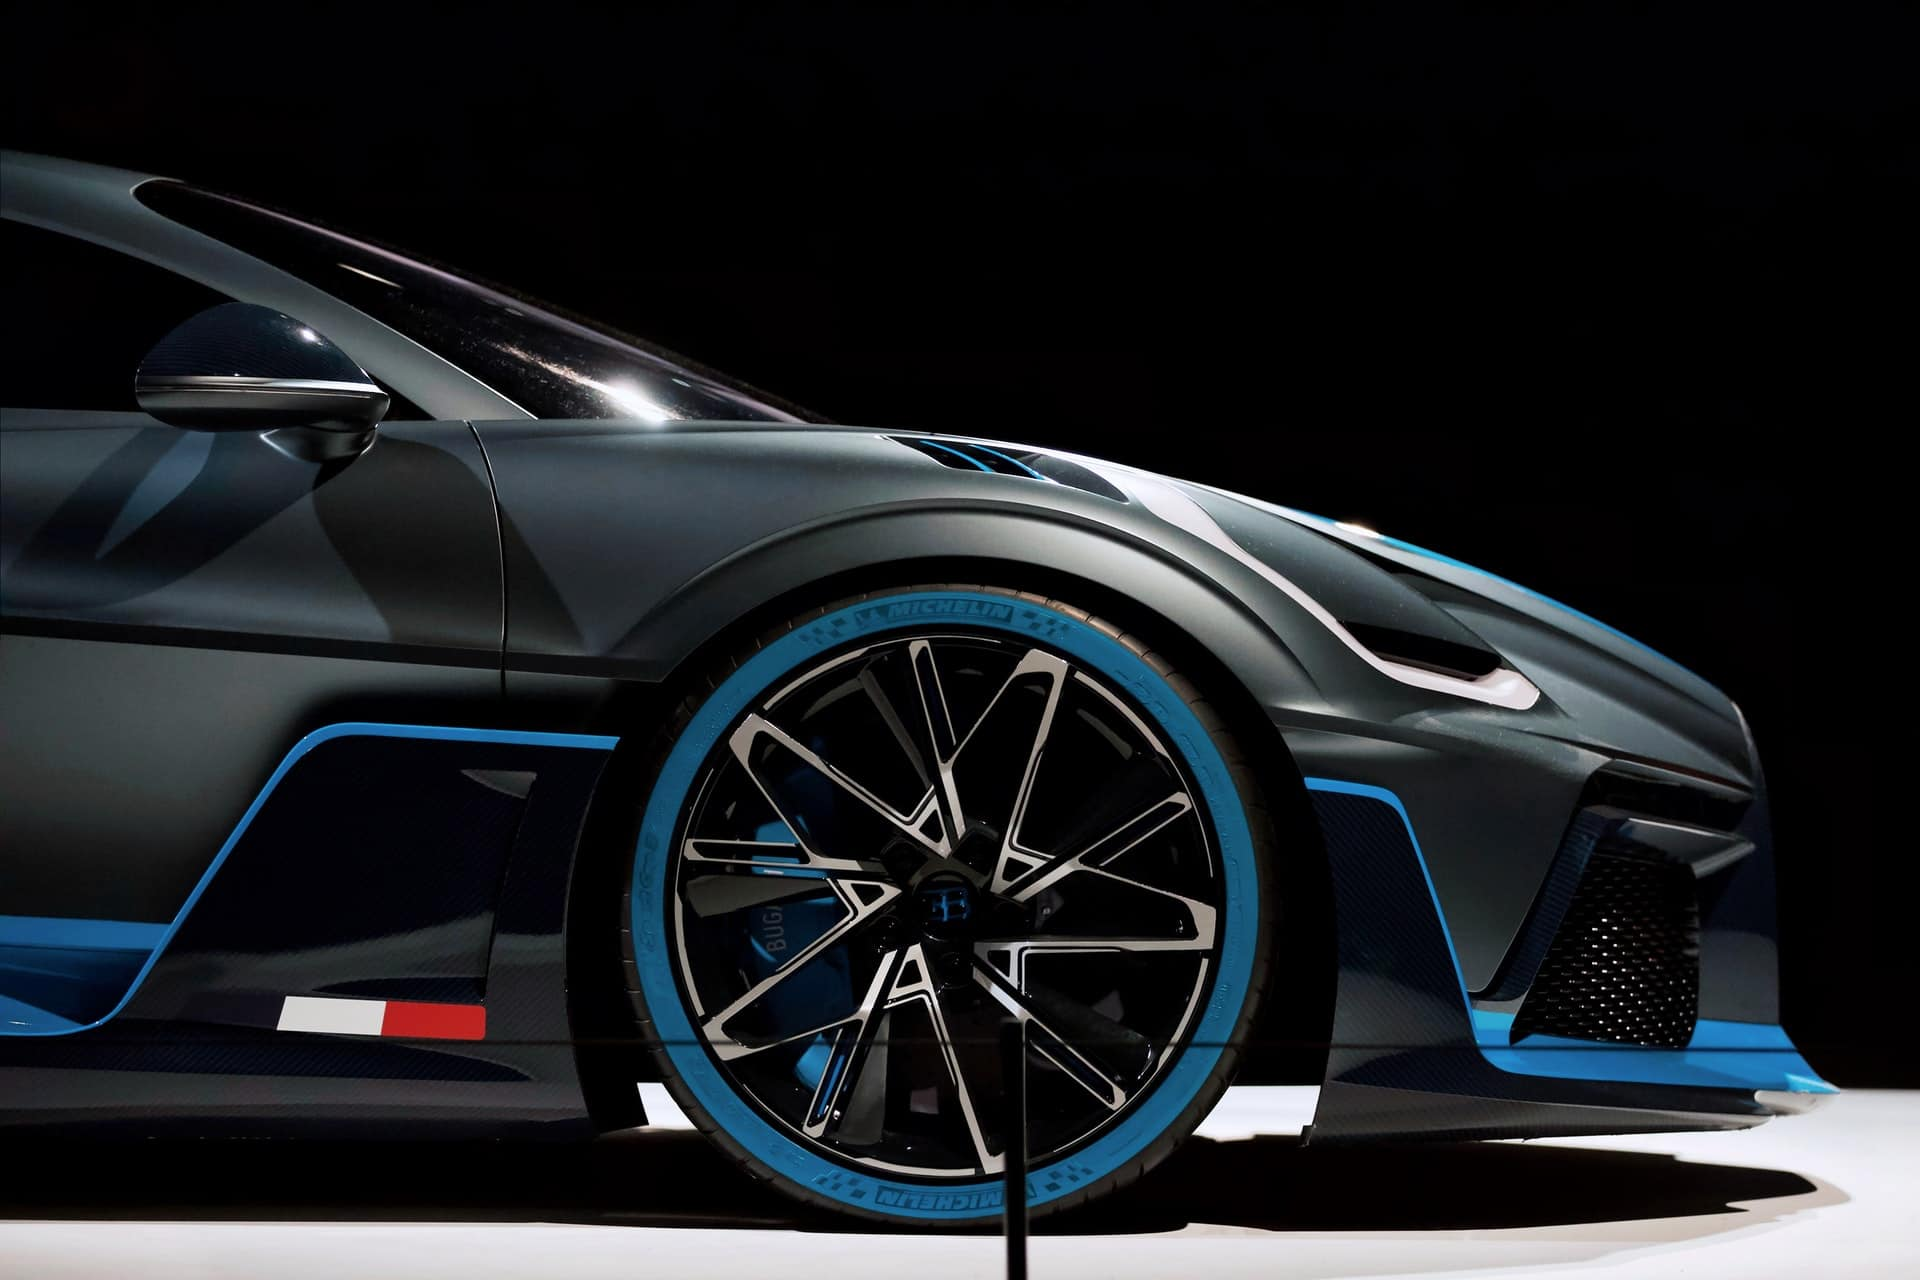 Finance News - Surprising Partnerships in 2021: Rimac Takes Over Bugatti